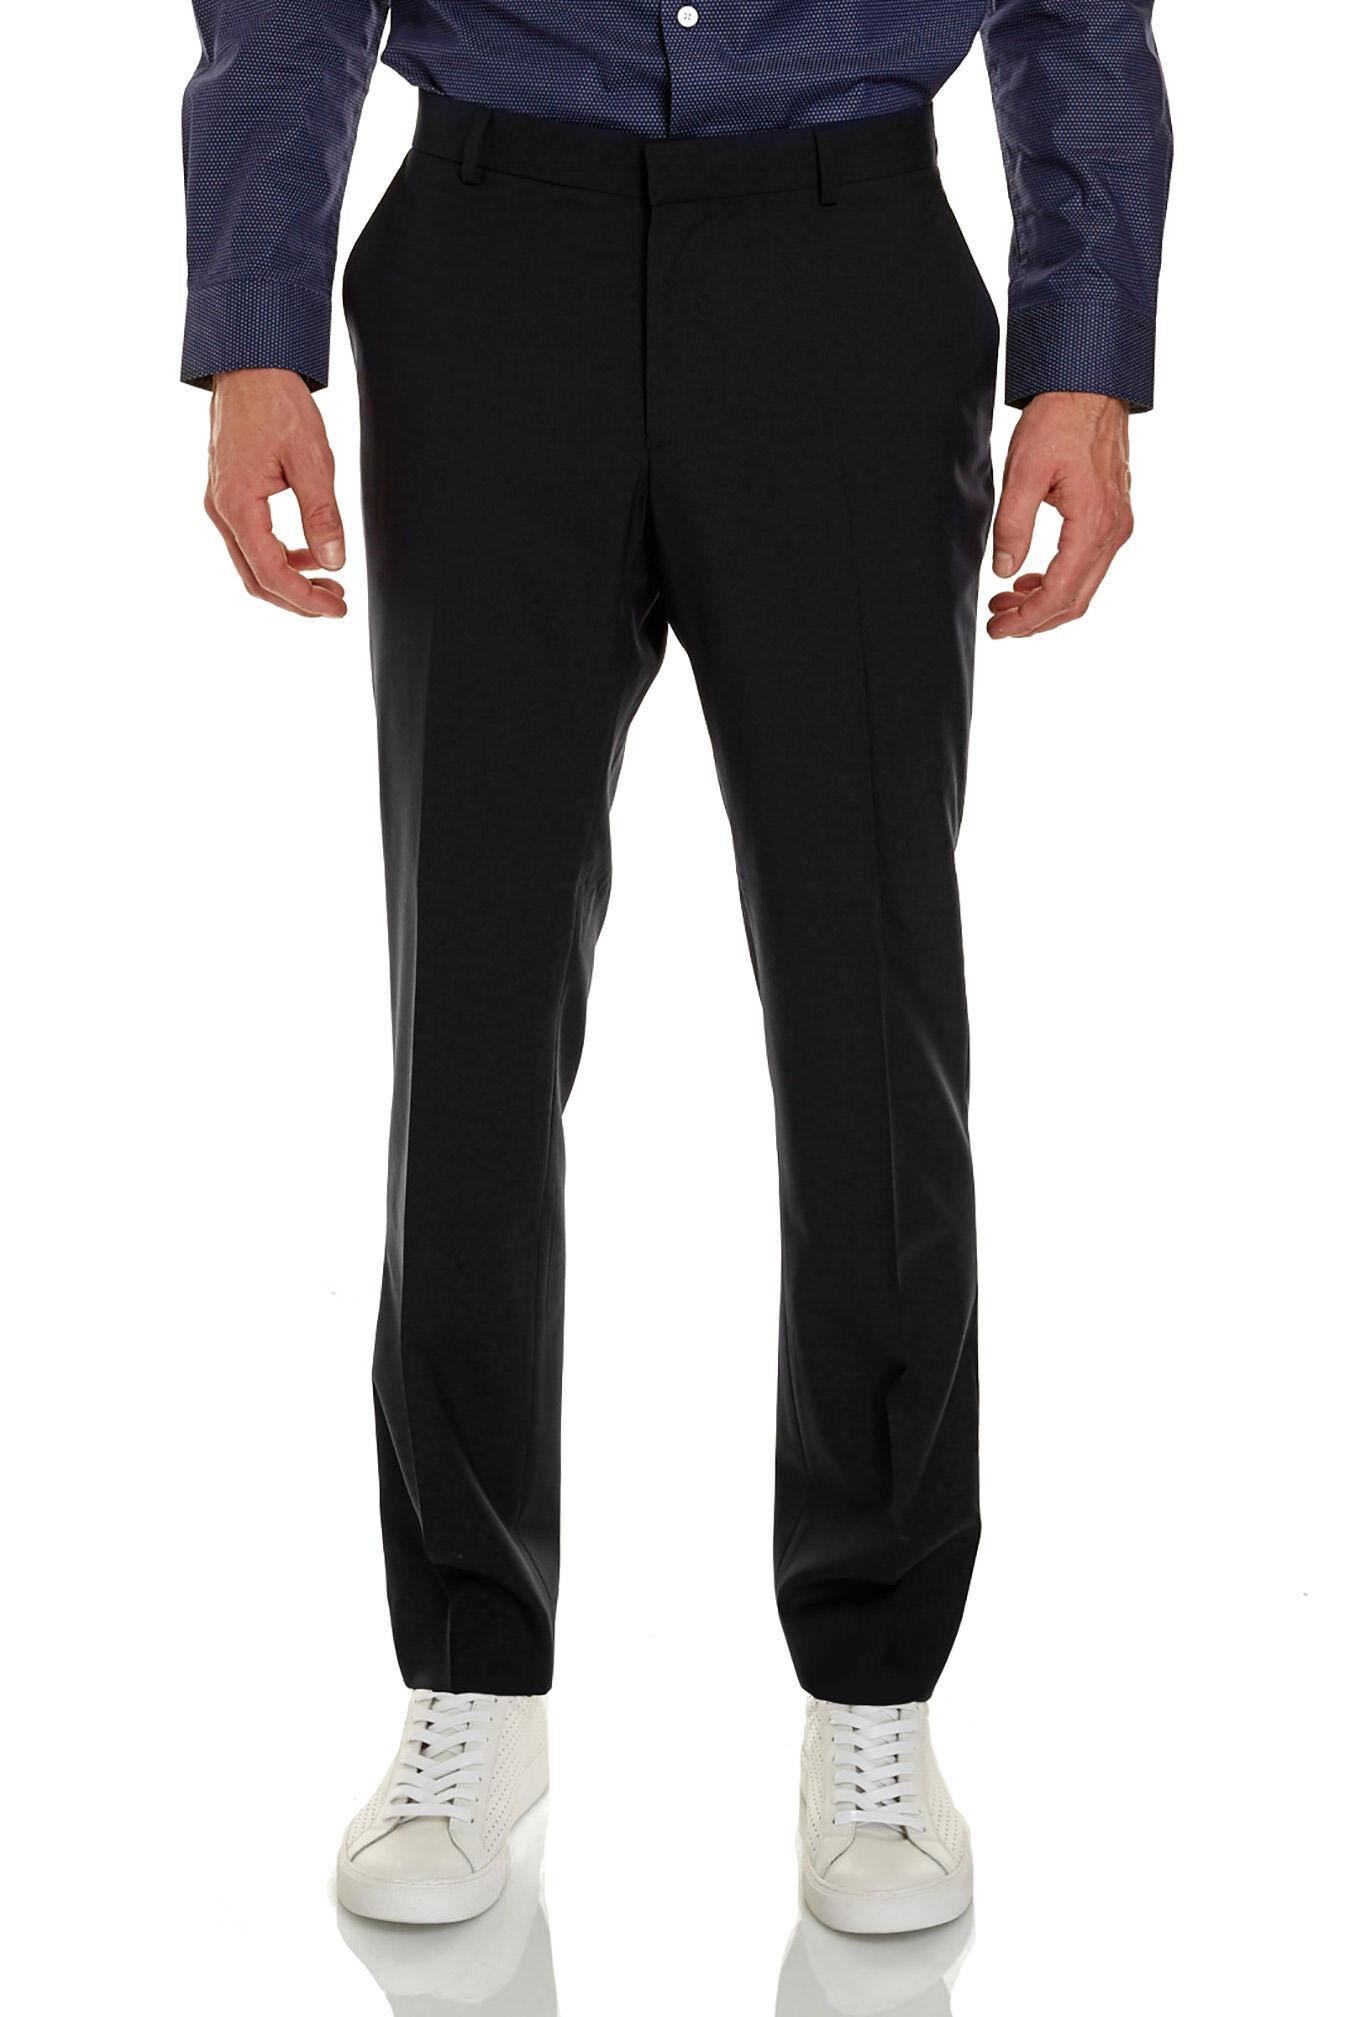 saba contemporary suit pant regularblack34